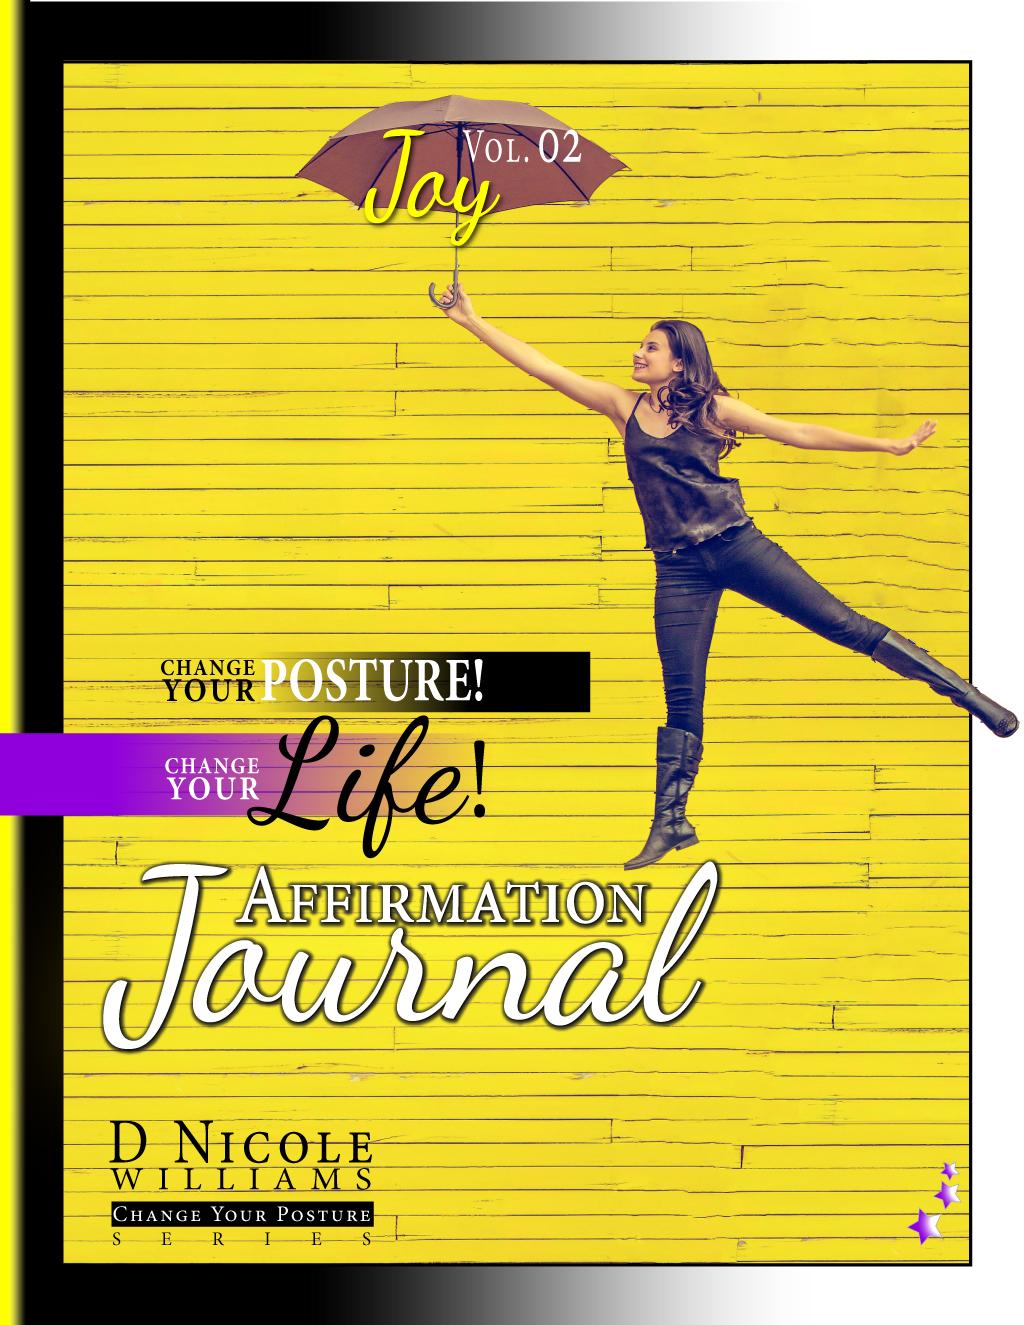 Change Your Posture! Change Your Life! Affirmation Journal Vol. 2: Joy